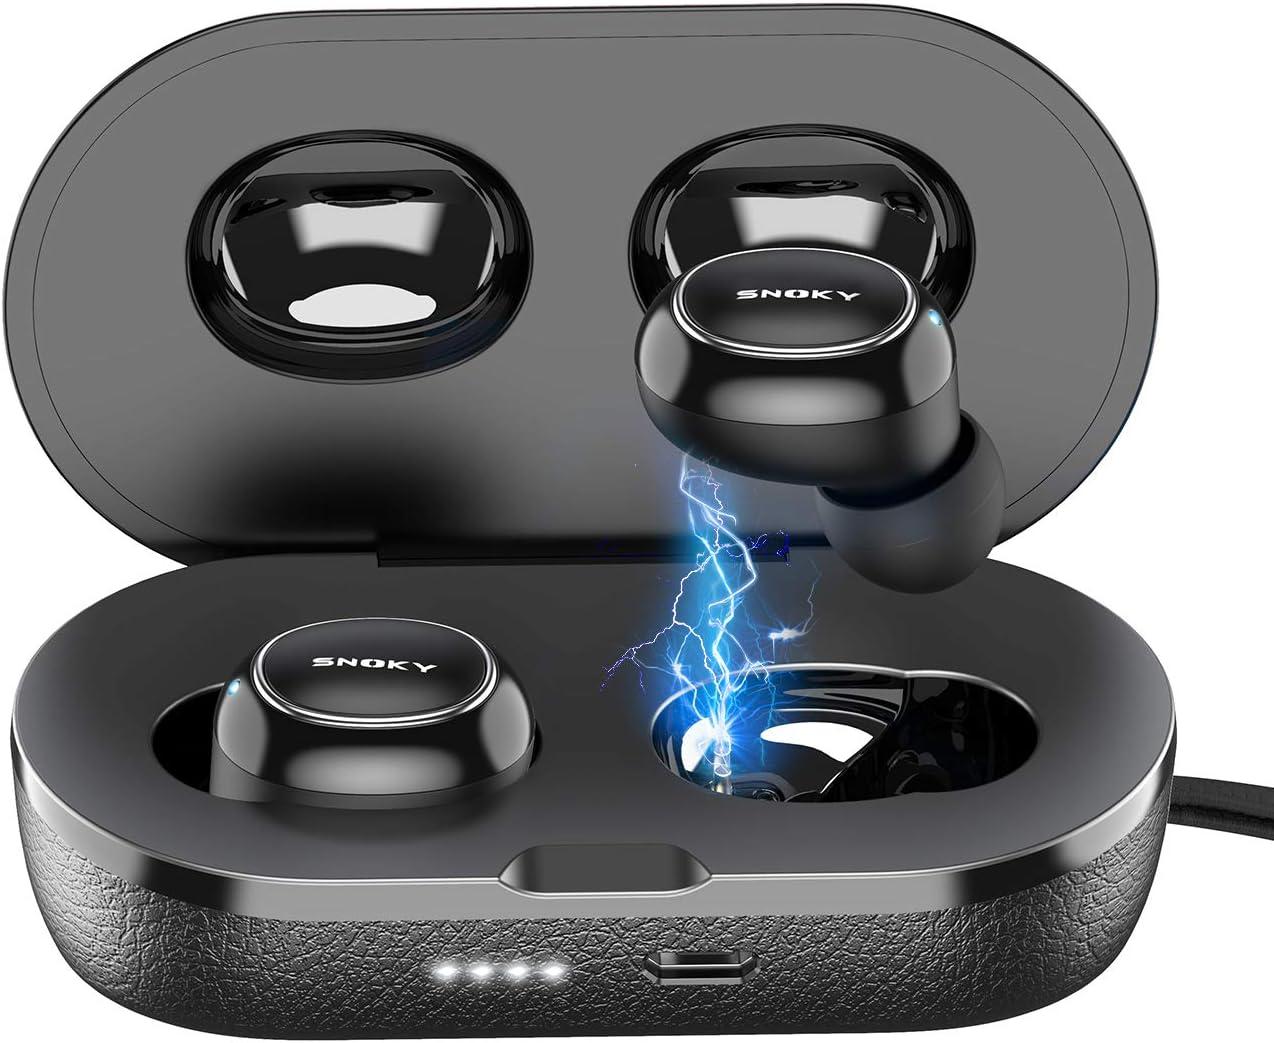 Snoky Wireless Accessories